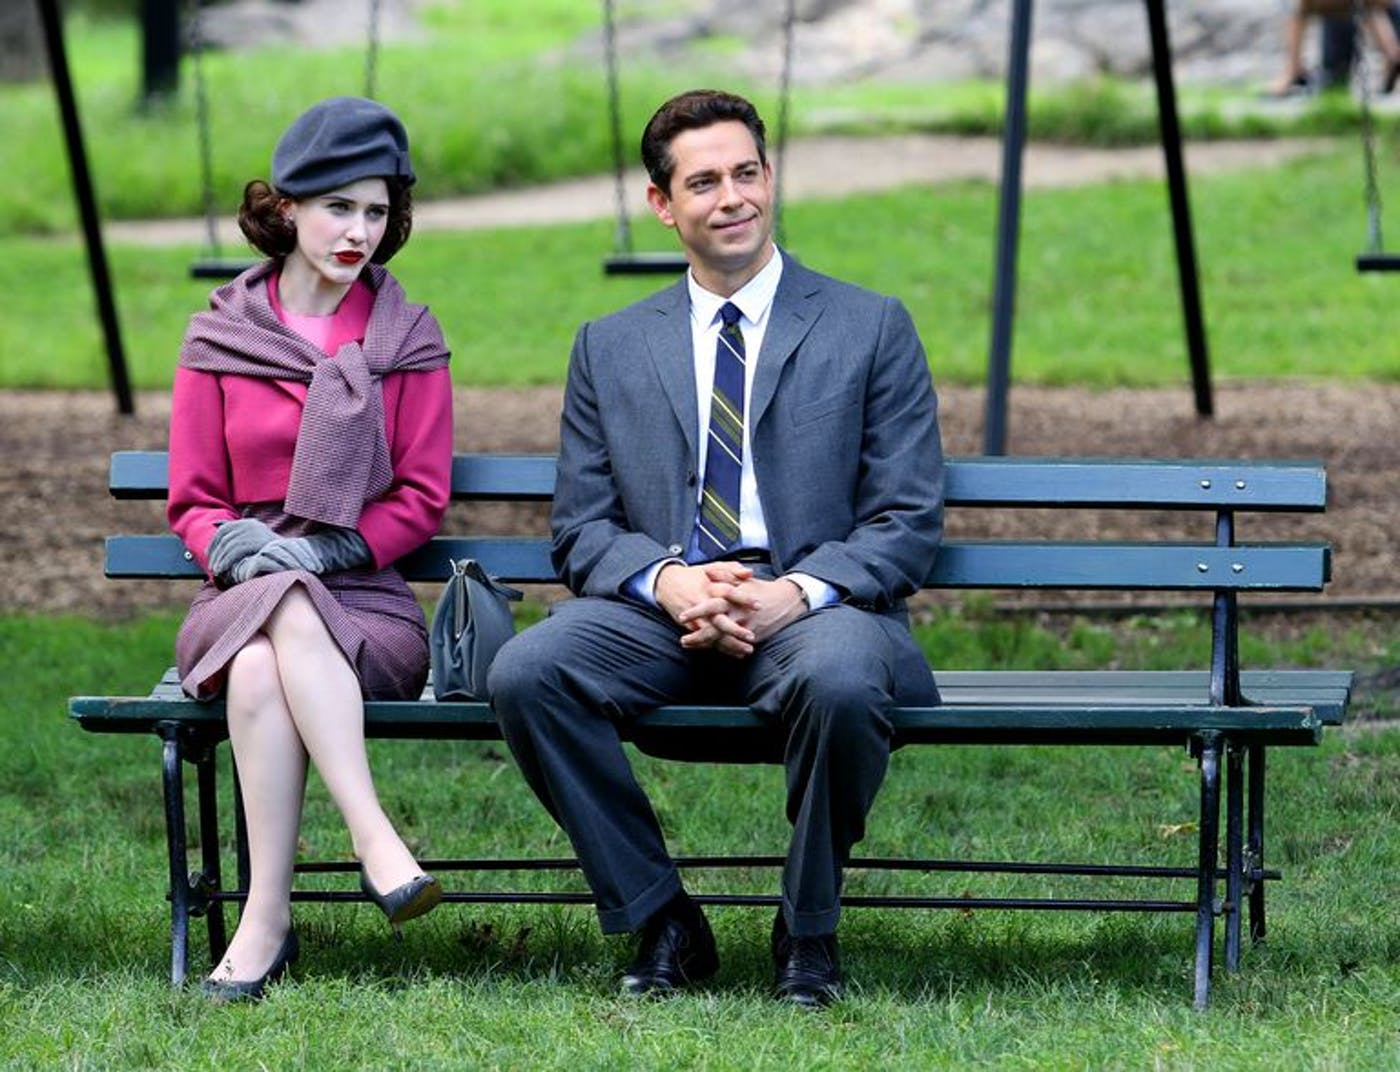 Marvelous Mrs  Maisel' Season 3: Release, Date, Cast, Trailer